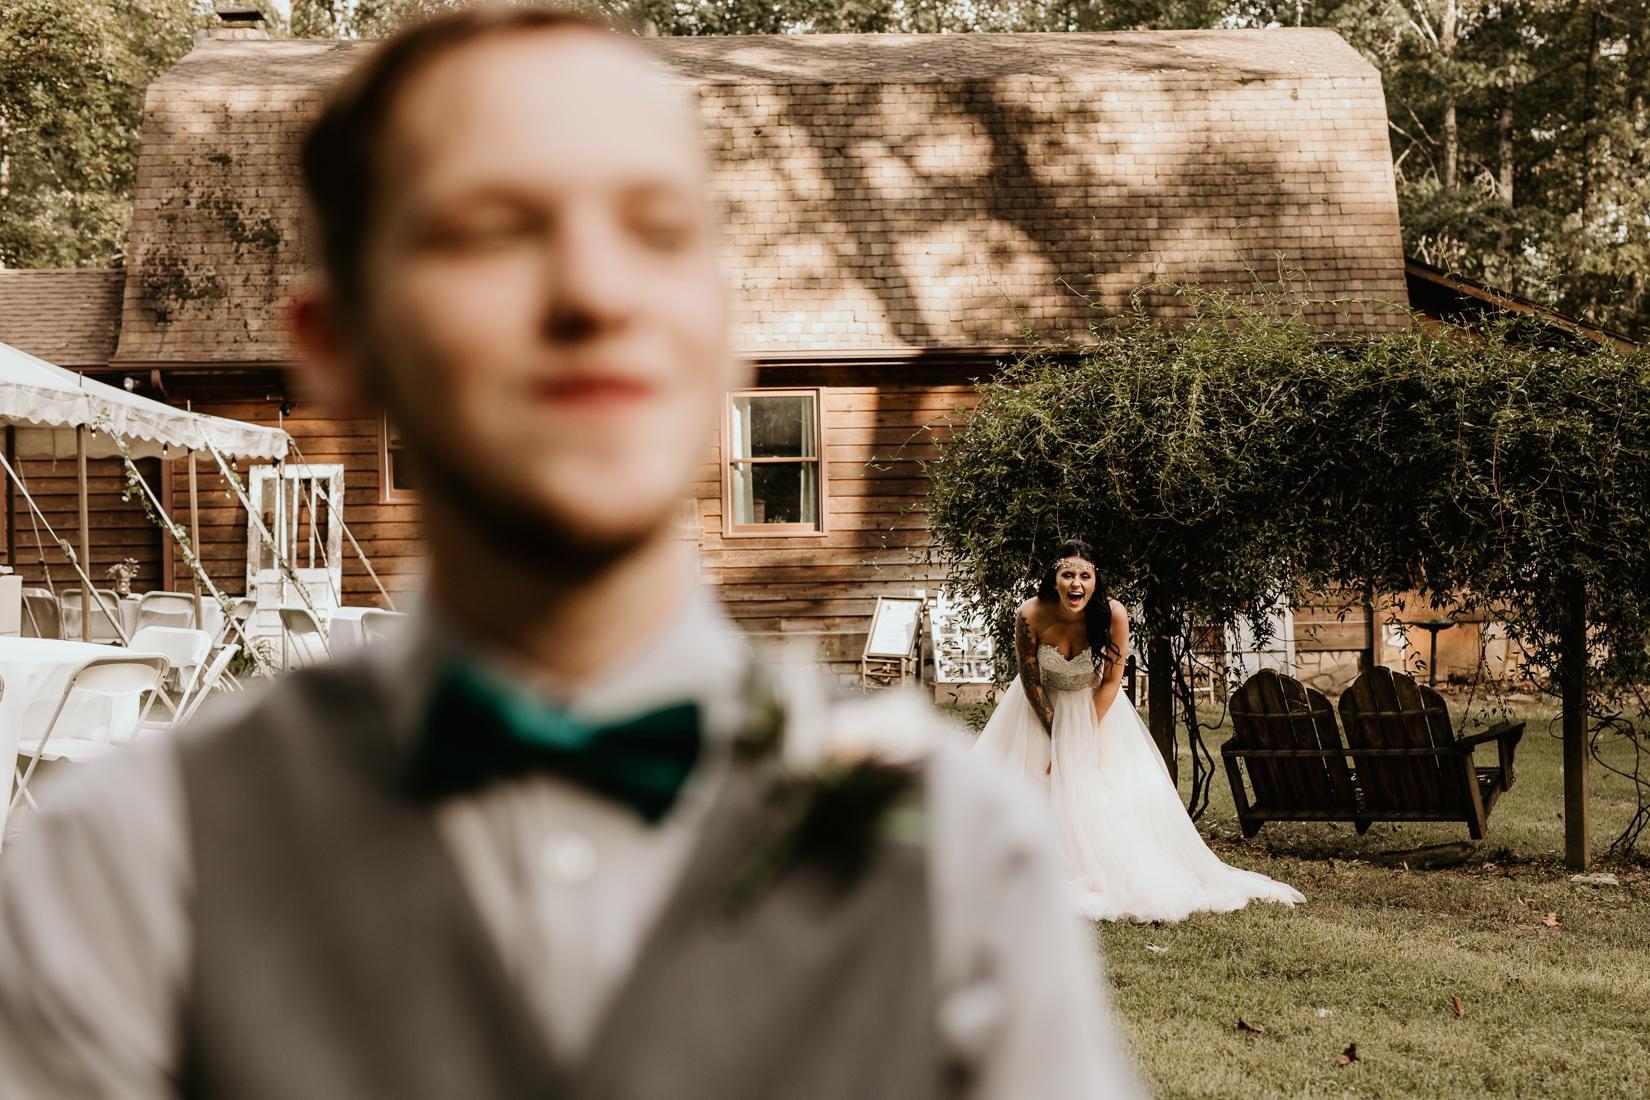 olivia_zay_wedding_09_2018-9470.jpg